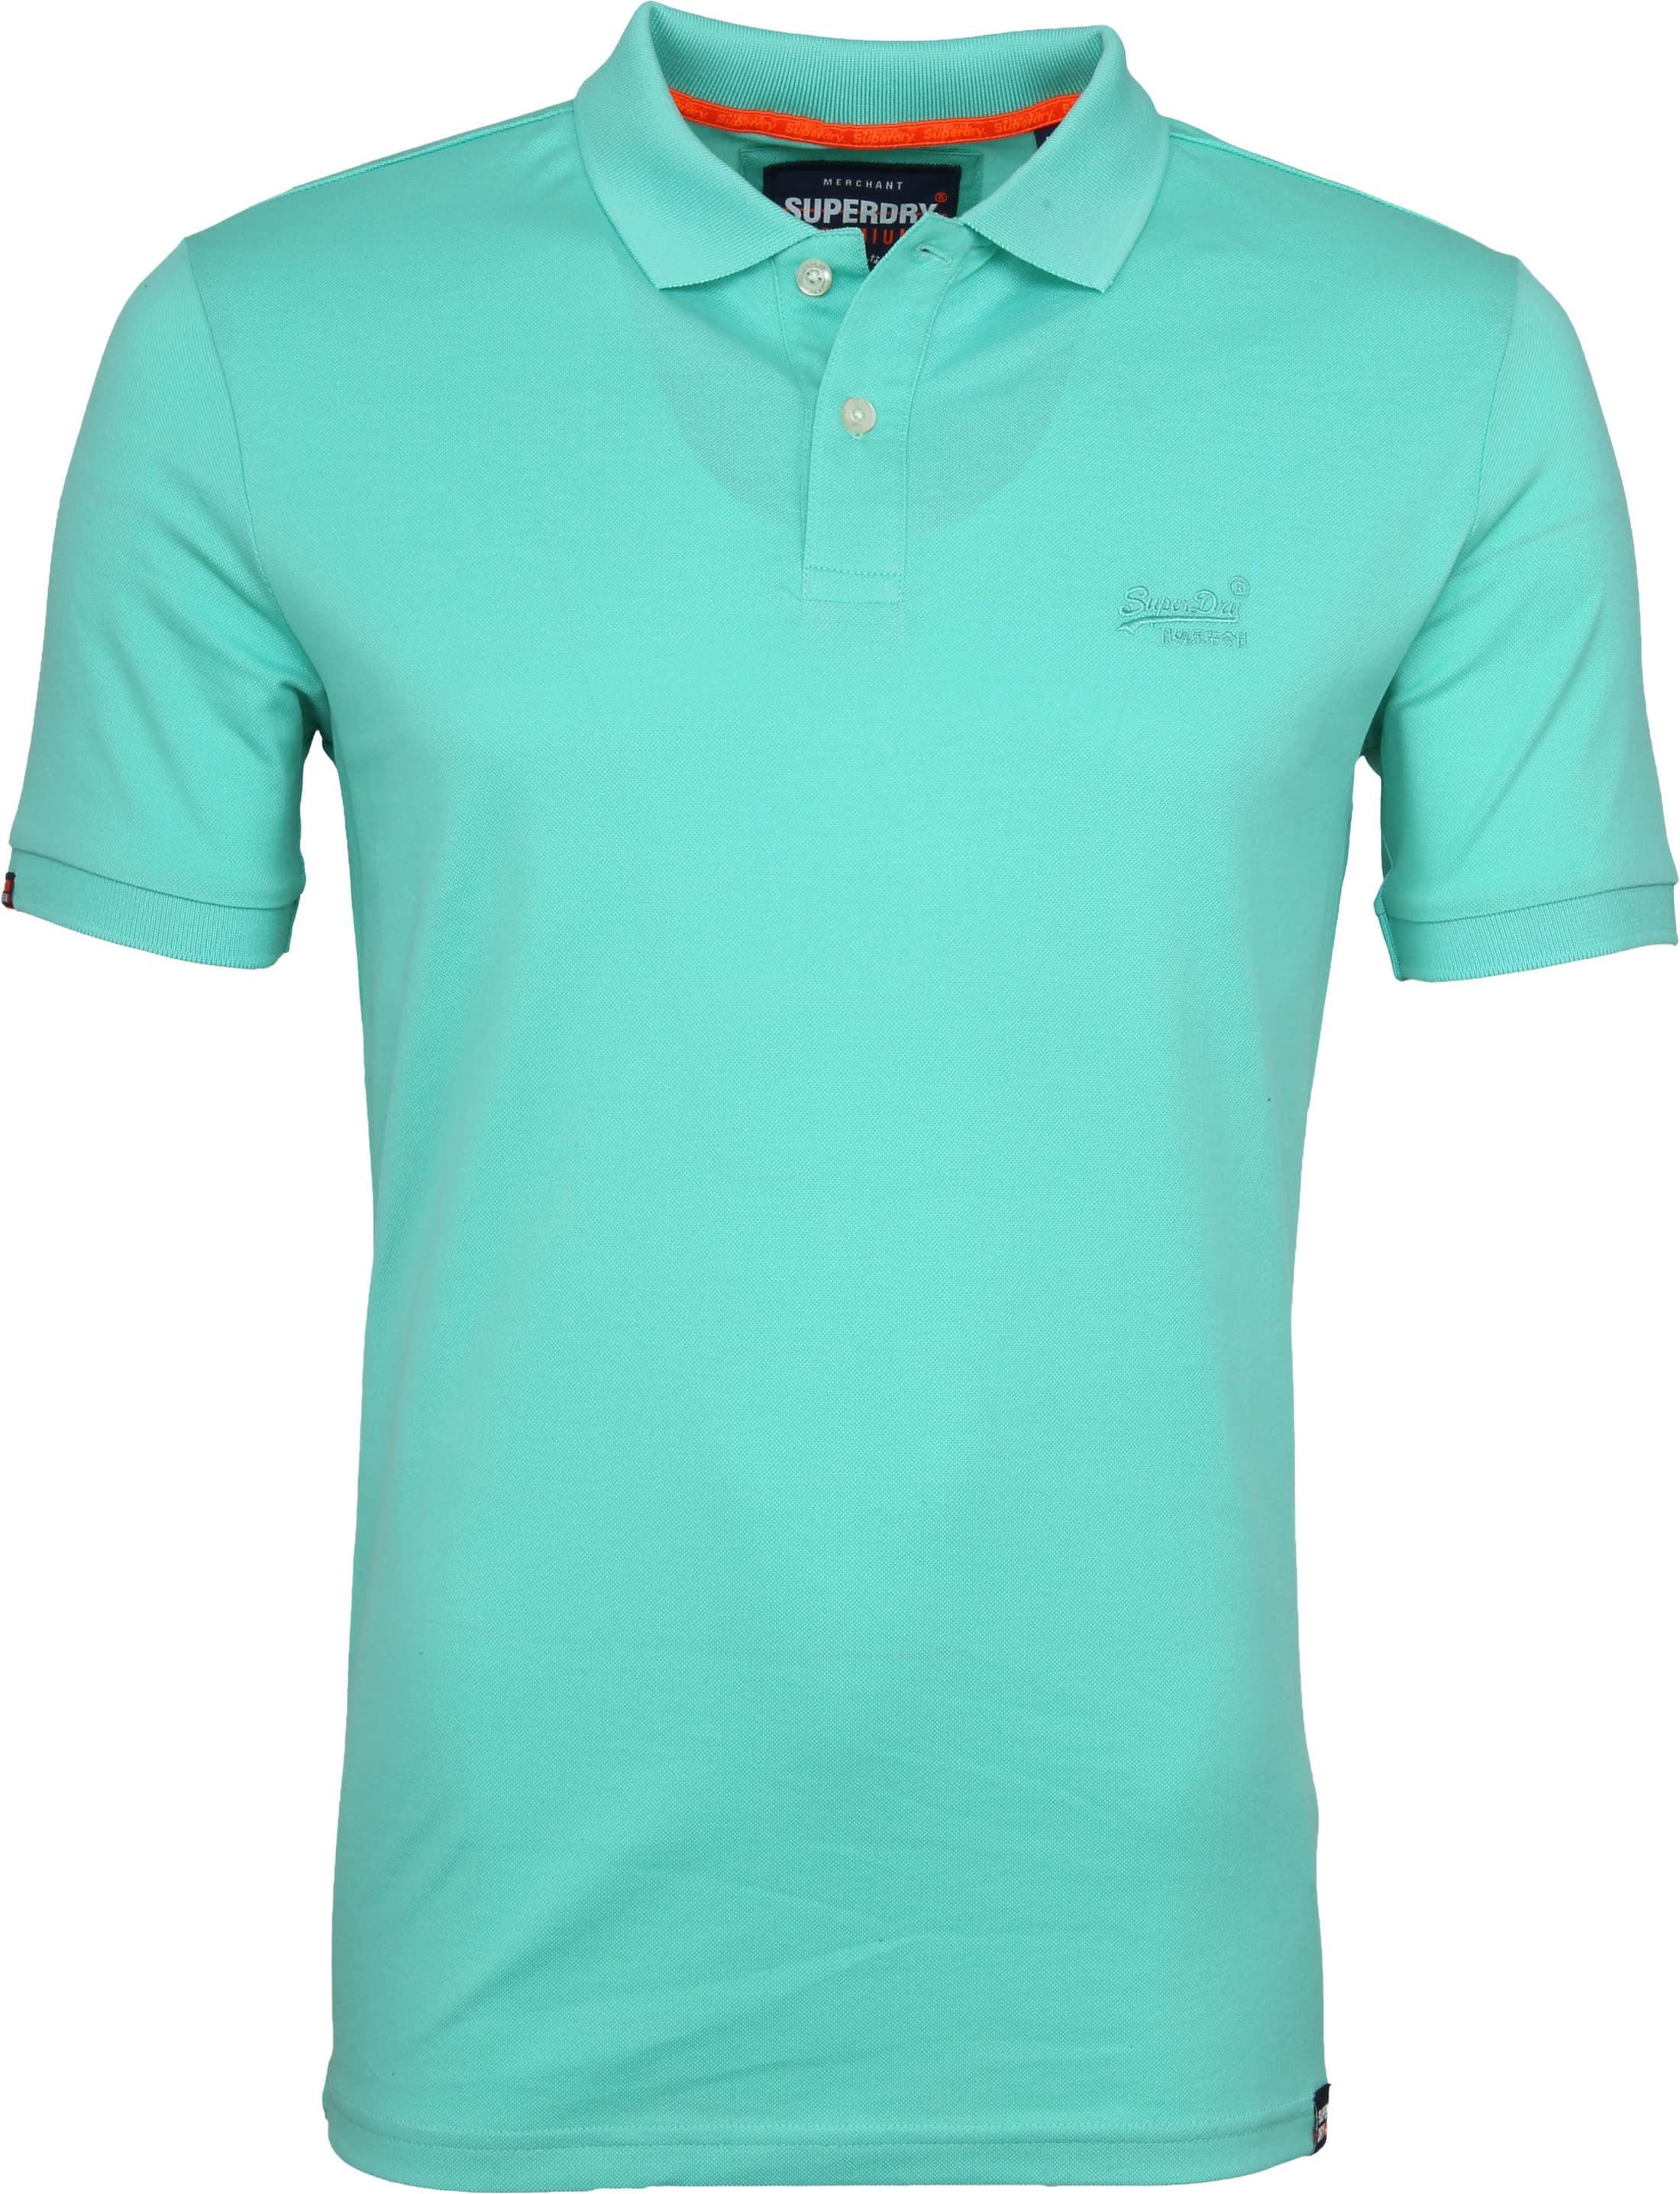 Superdry Poloshirt Premium Turquoise foto 0